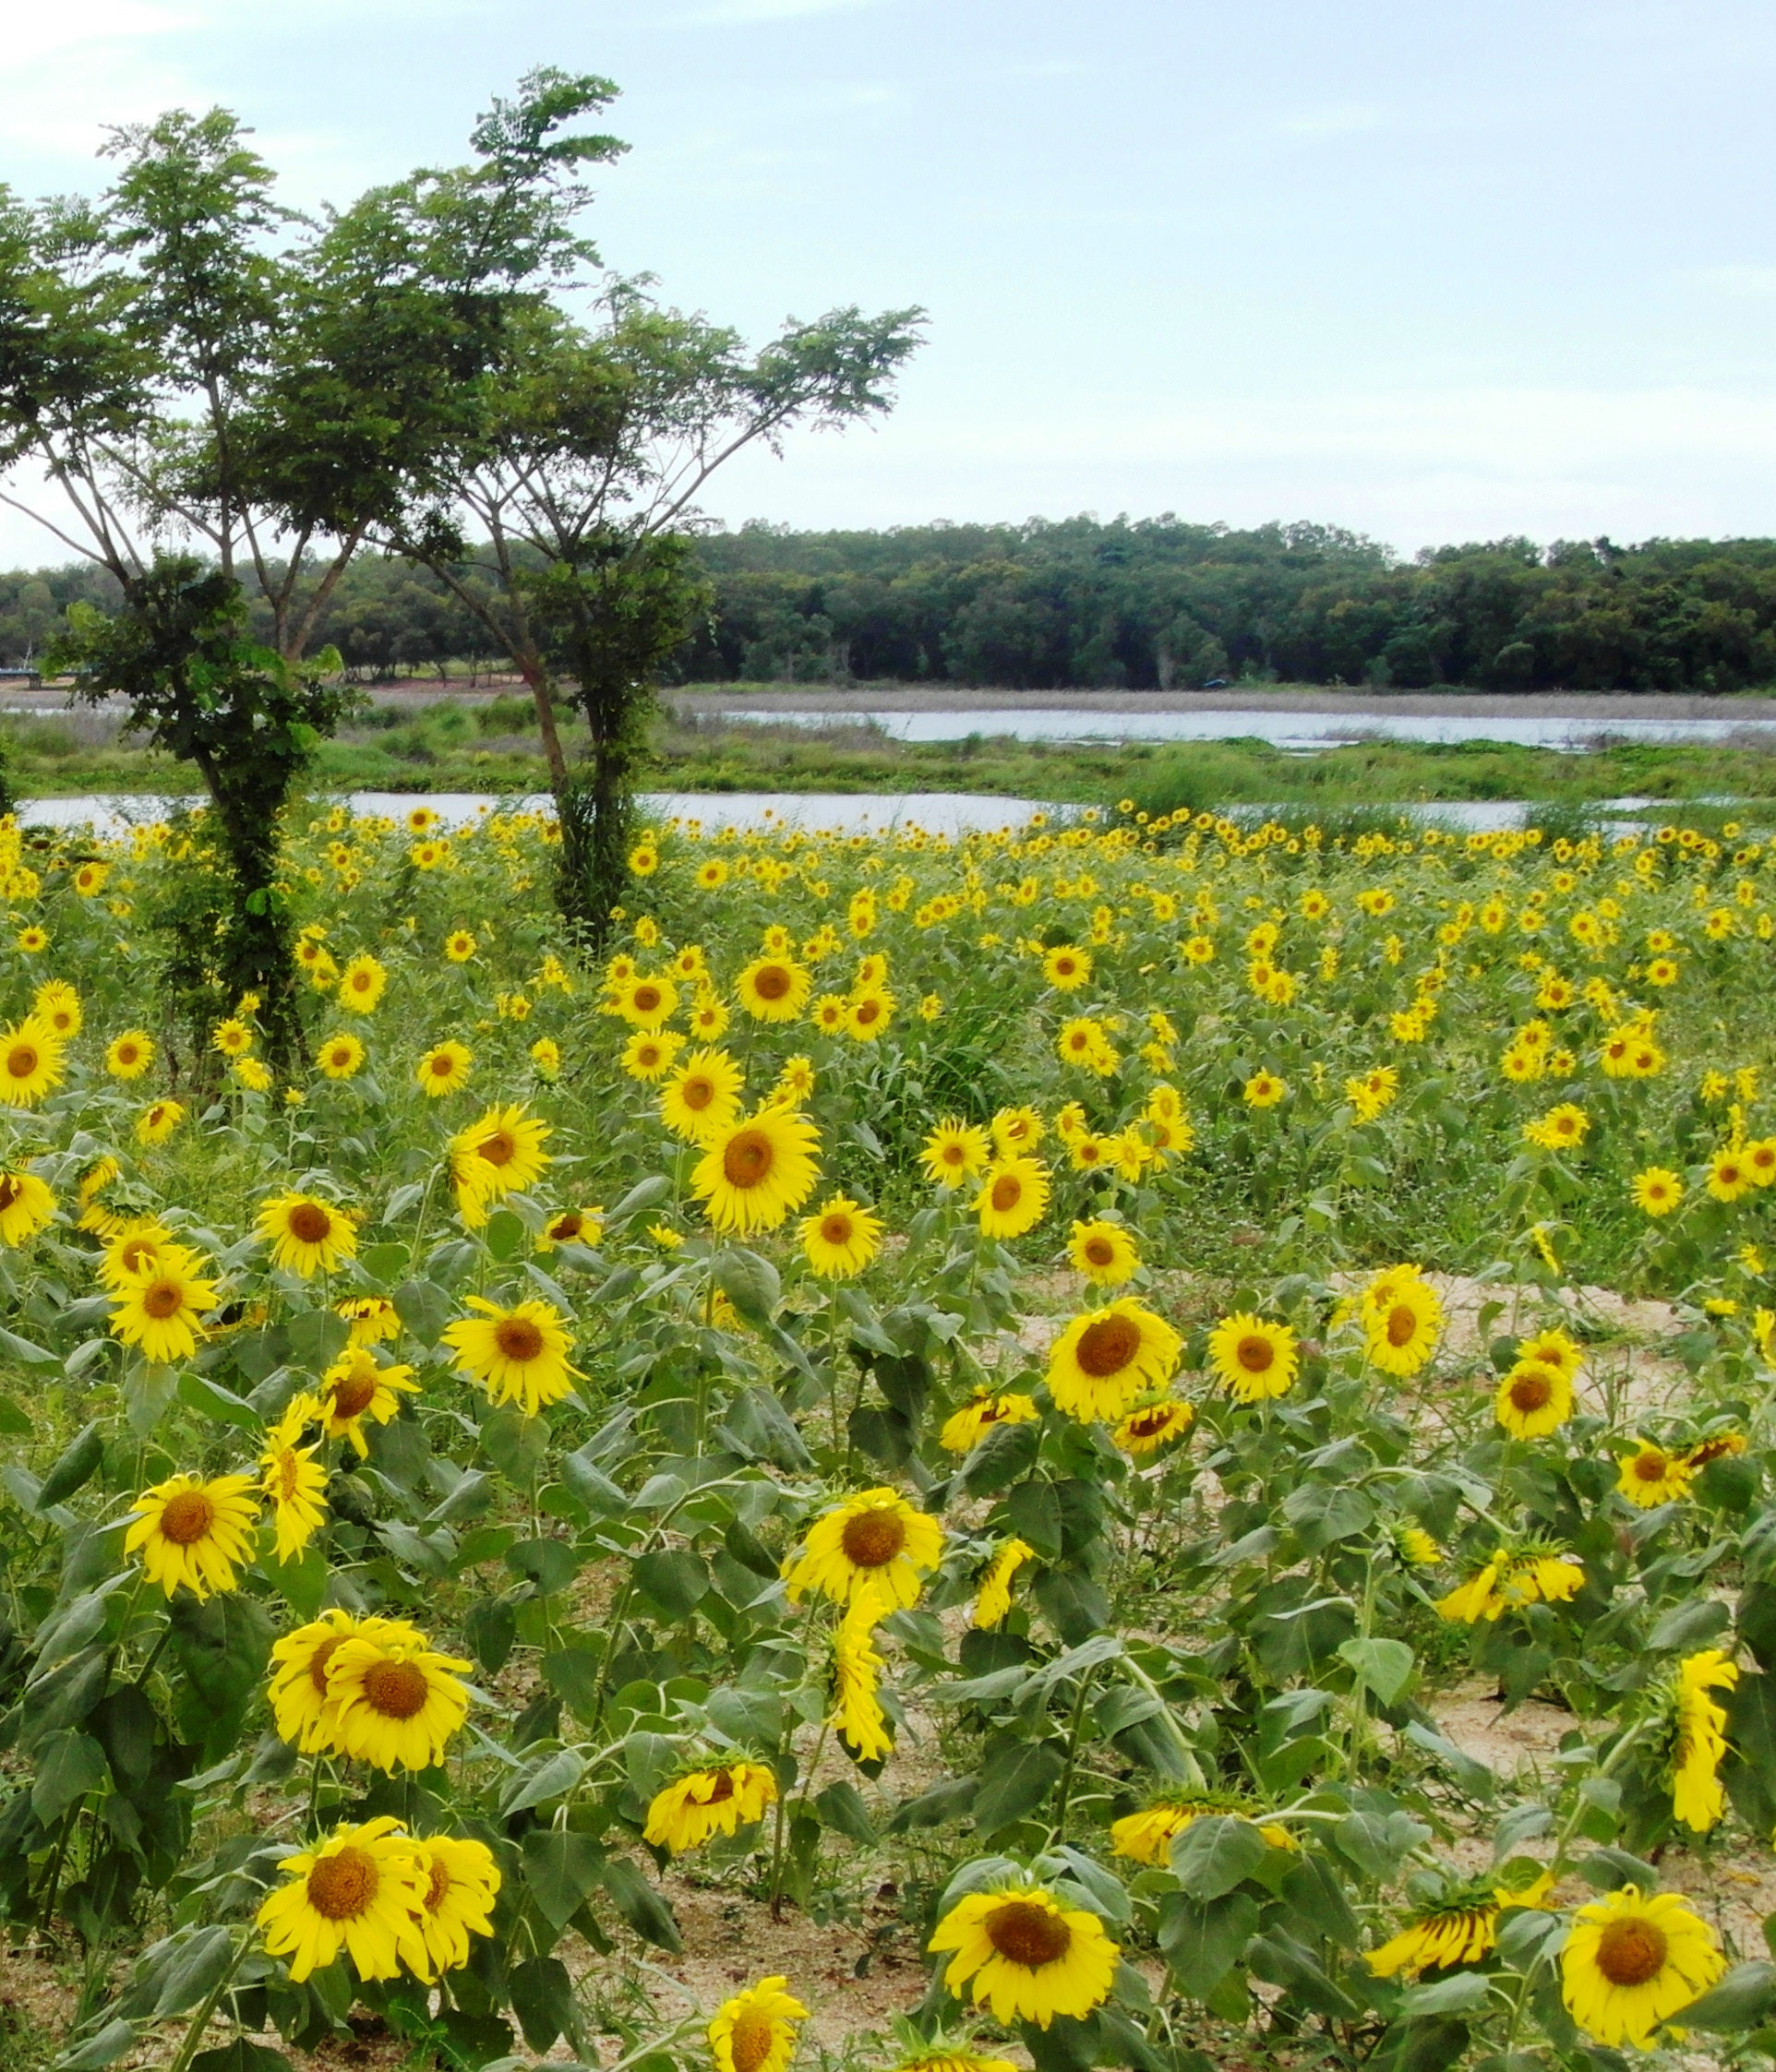 Sunflower field photo